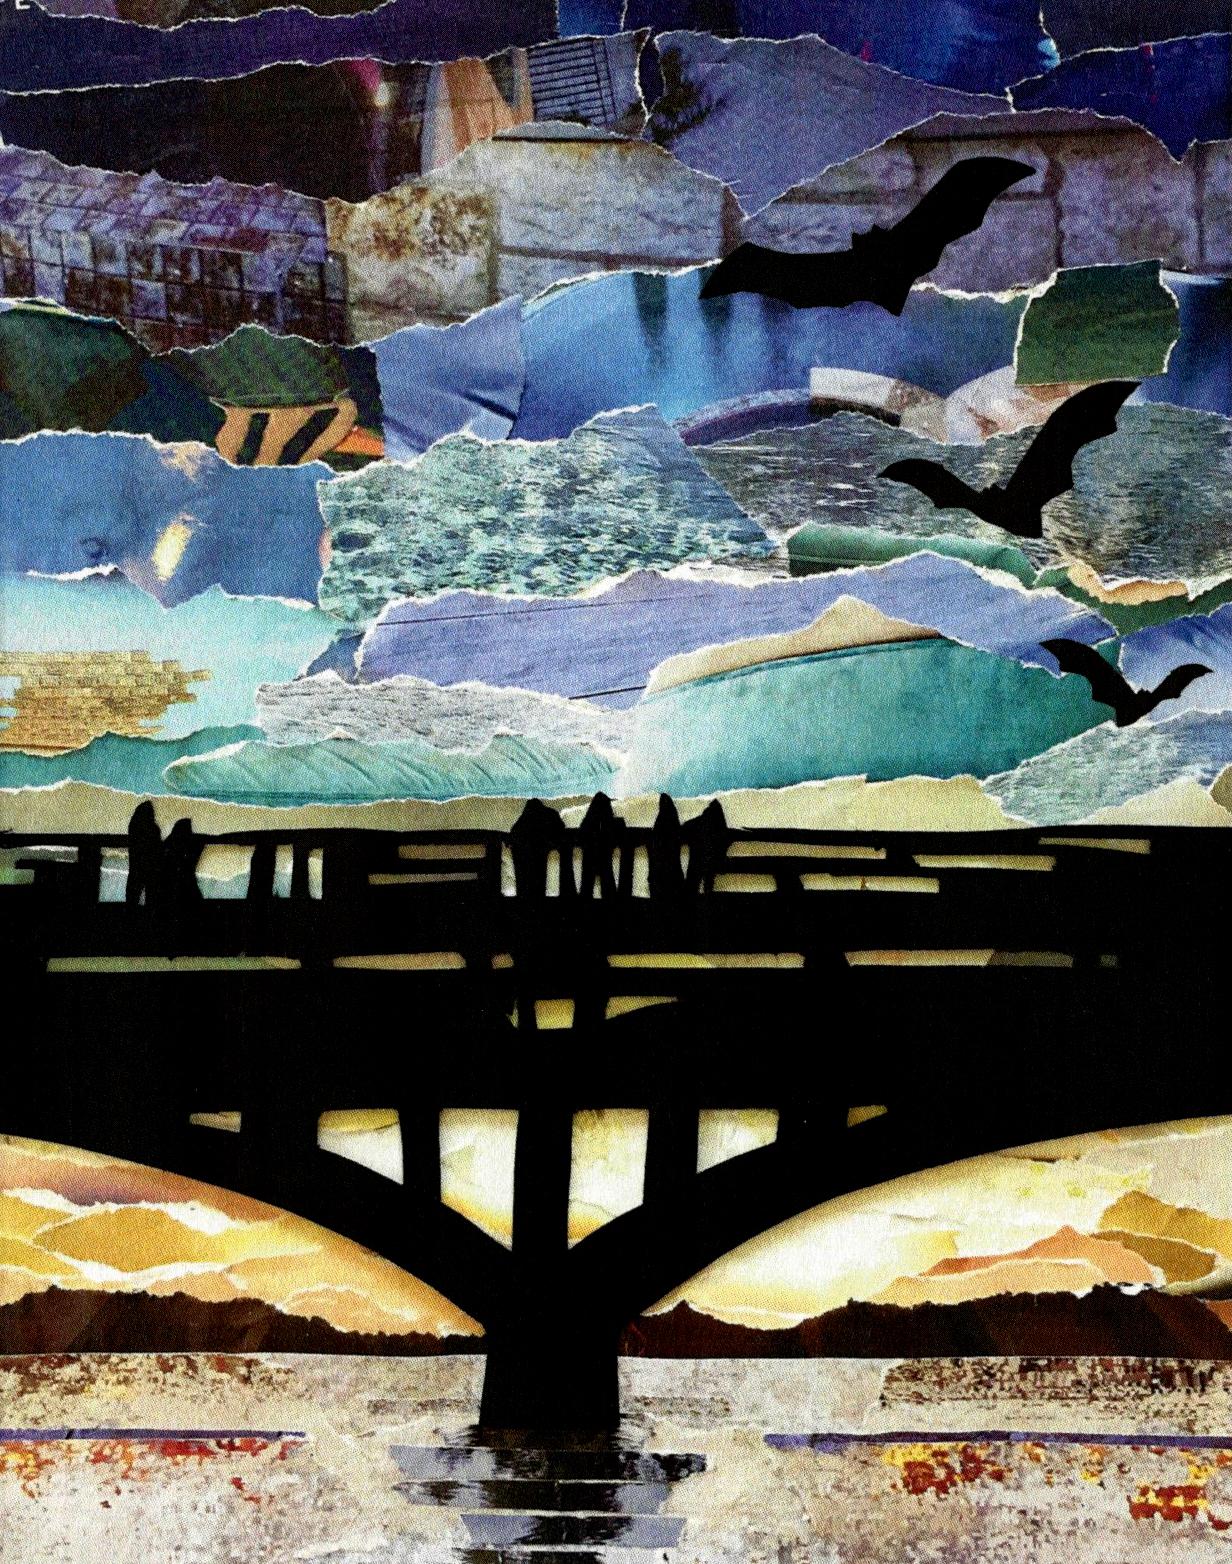 Congress St. Bat bridge at twilight, 9x12